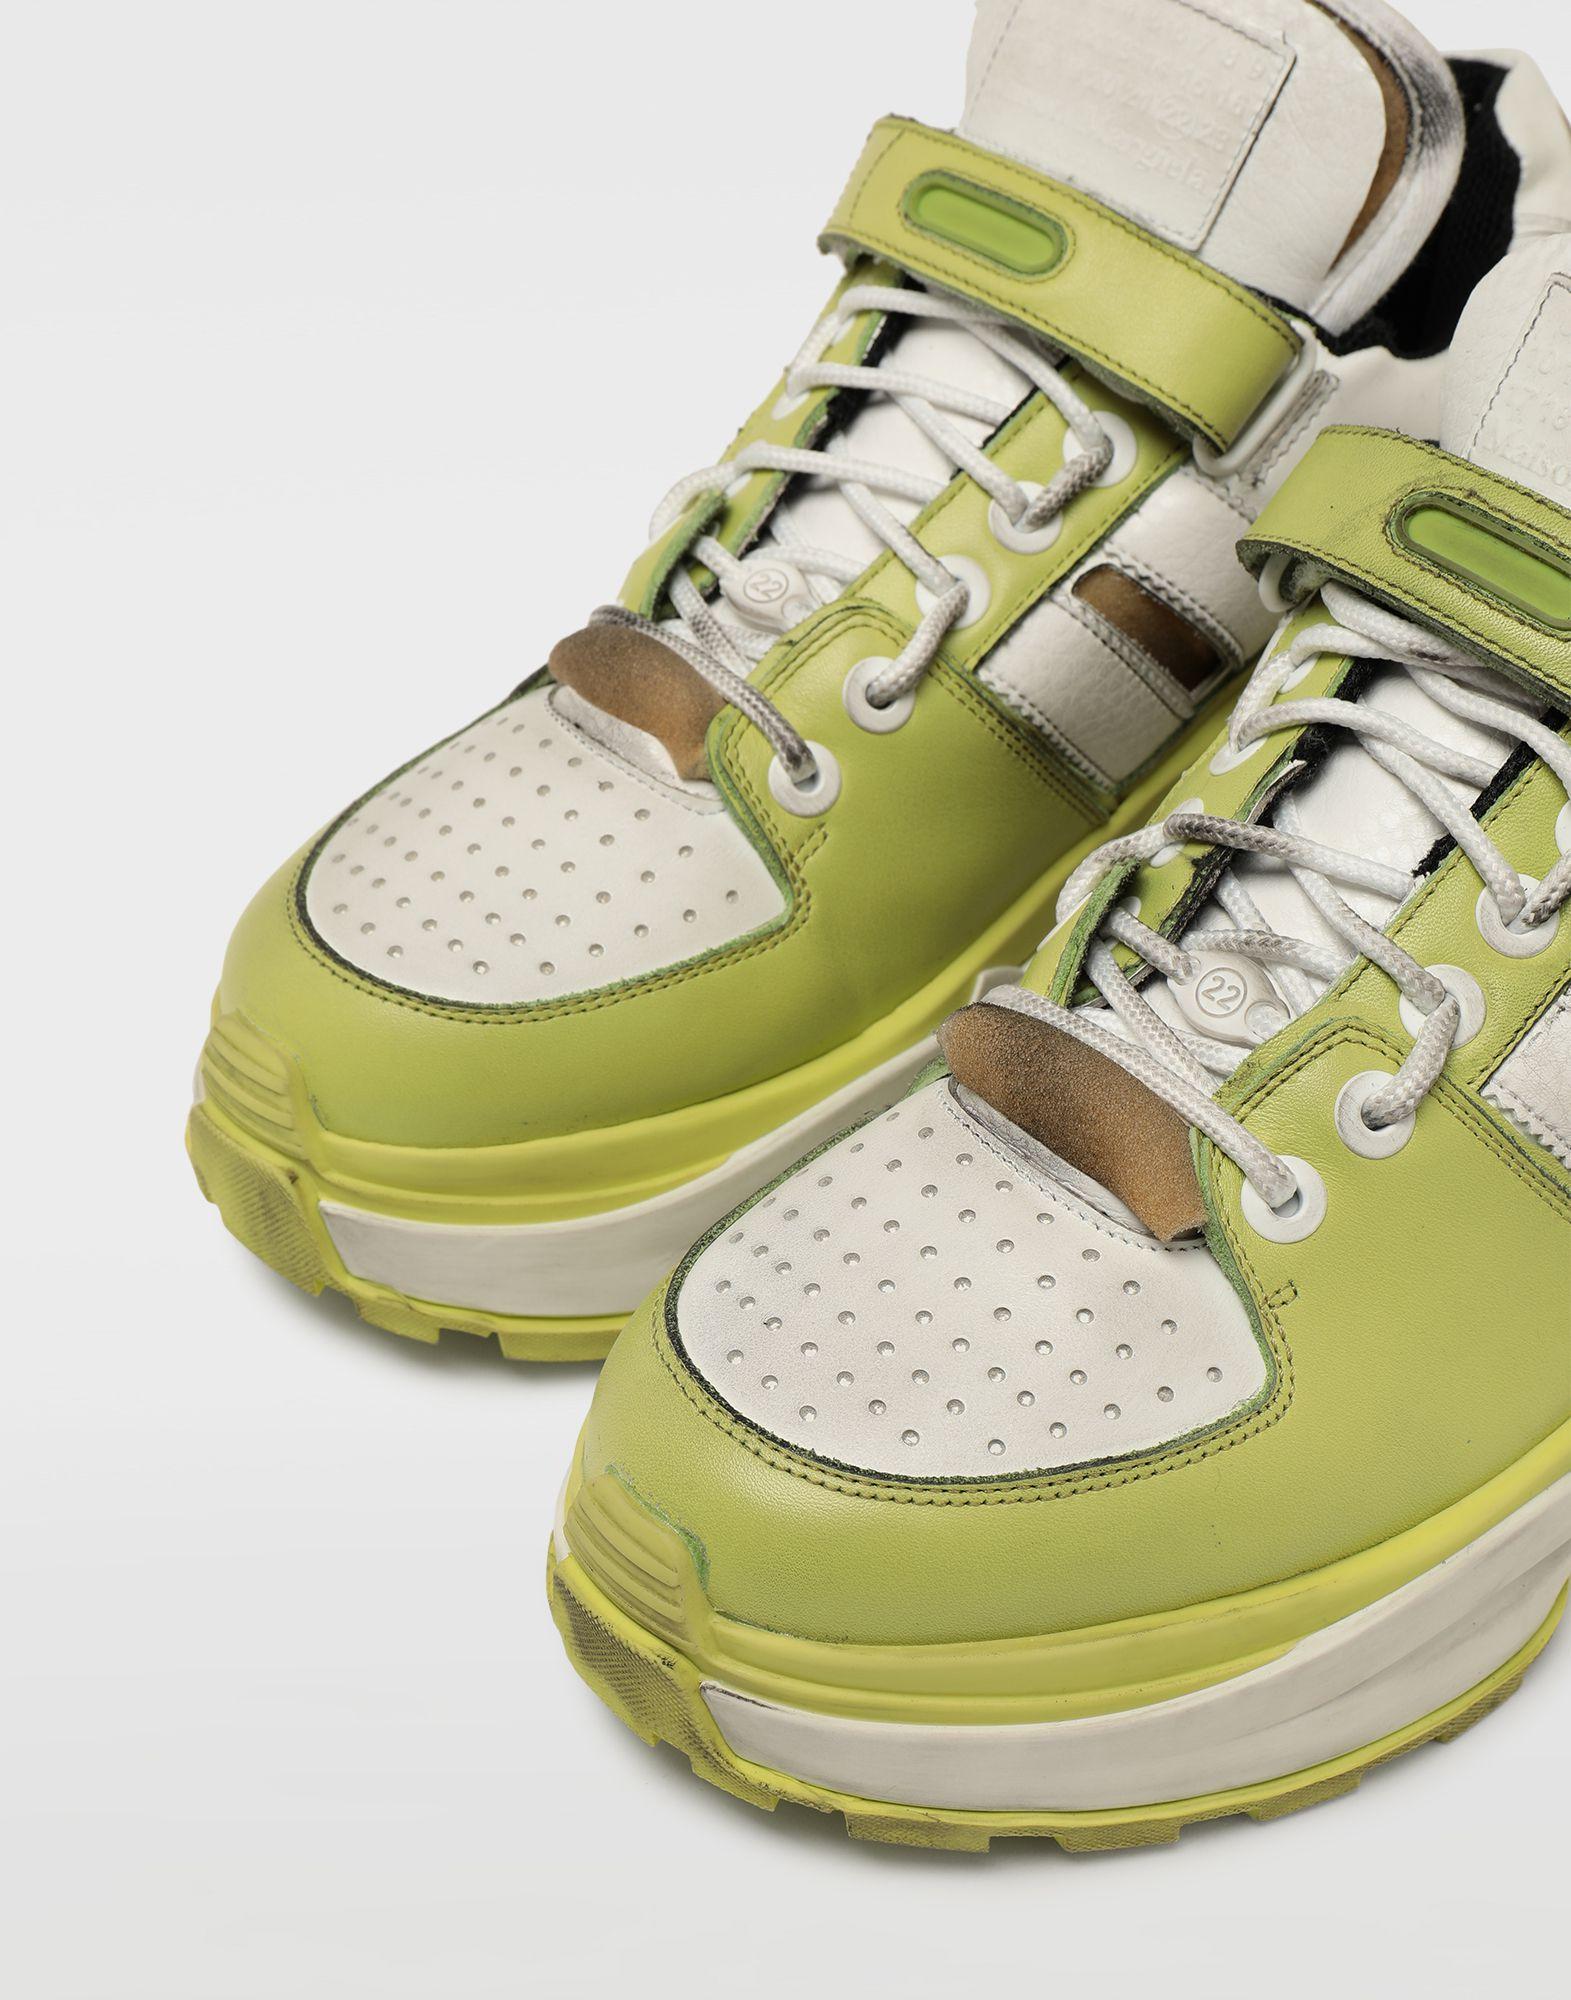 MAISON MARGIELA Low-Top-Sneakers Retro Fit Sneakers Herren e